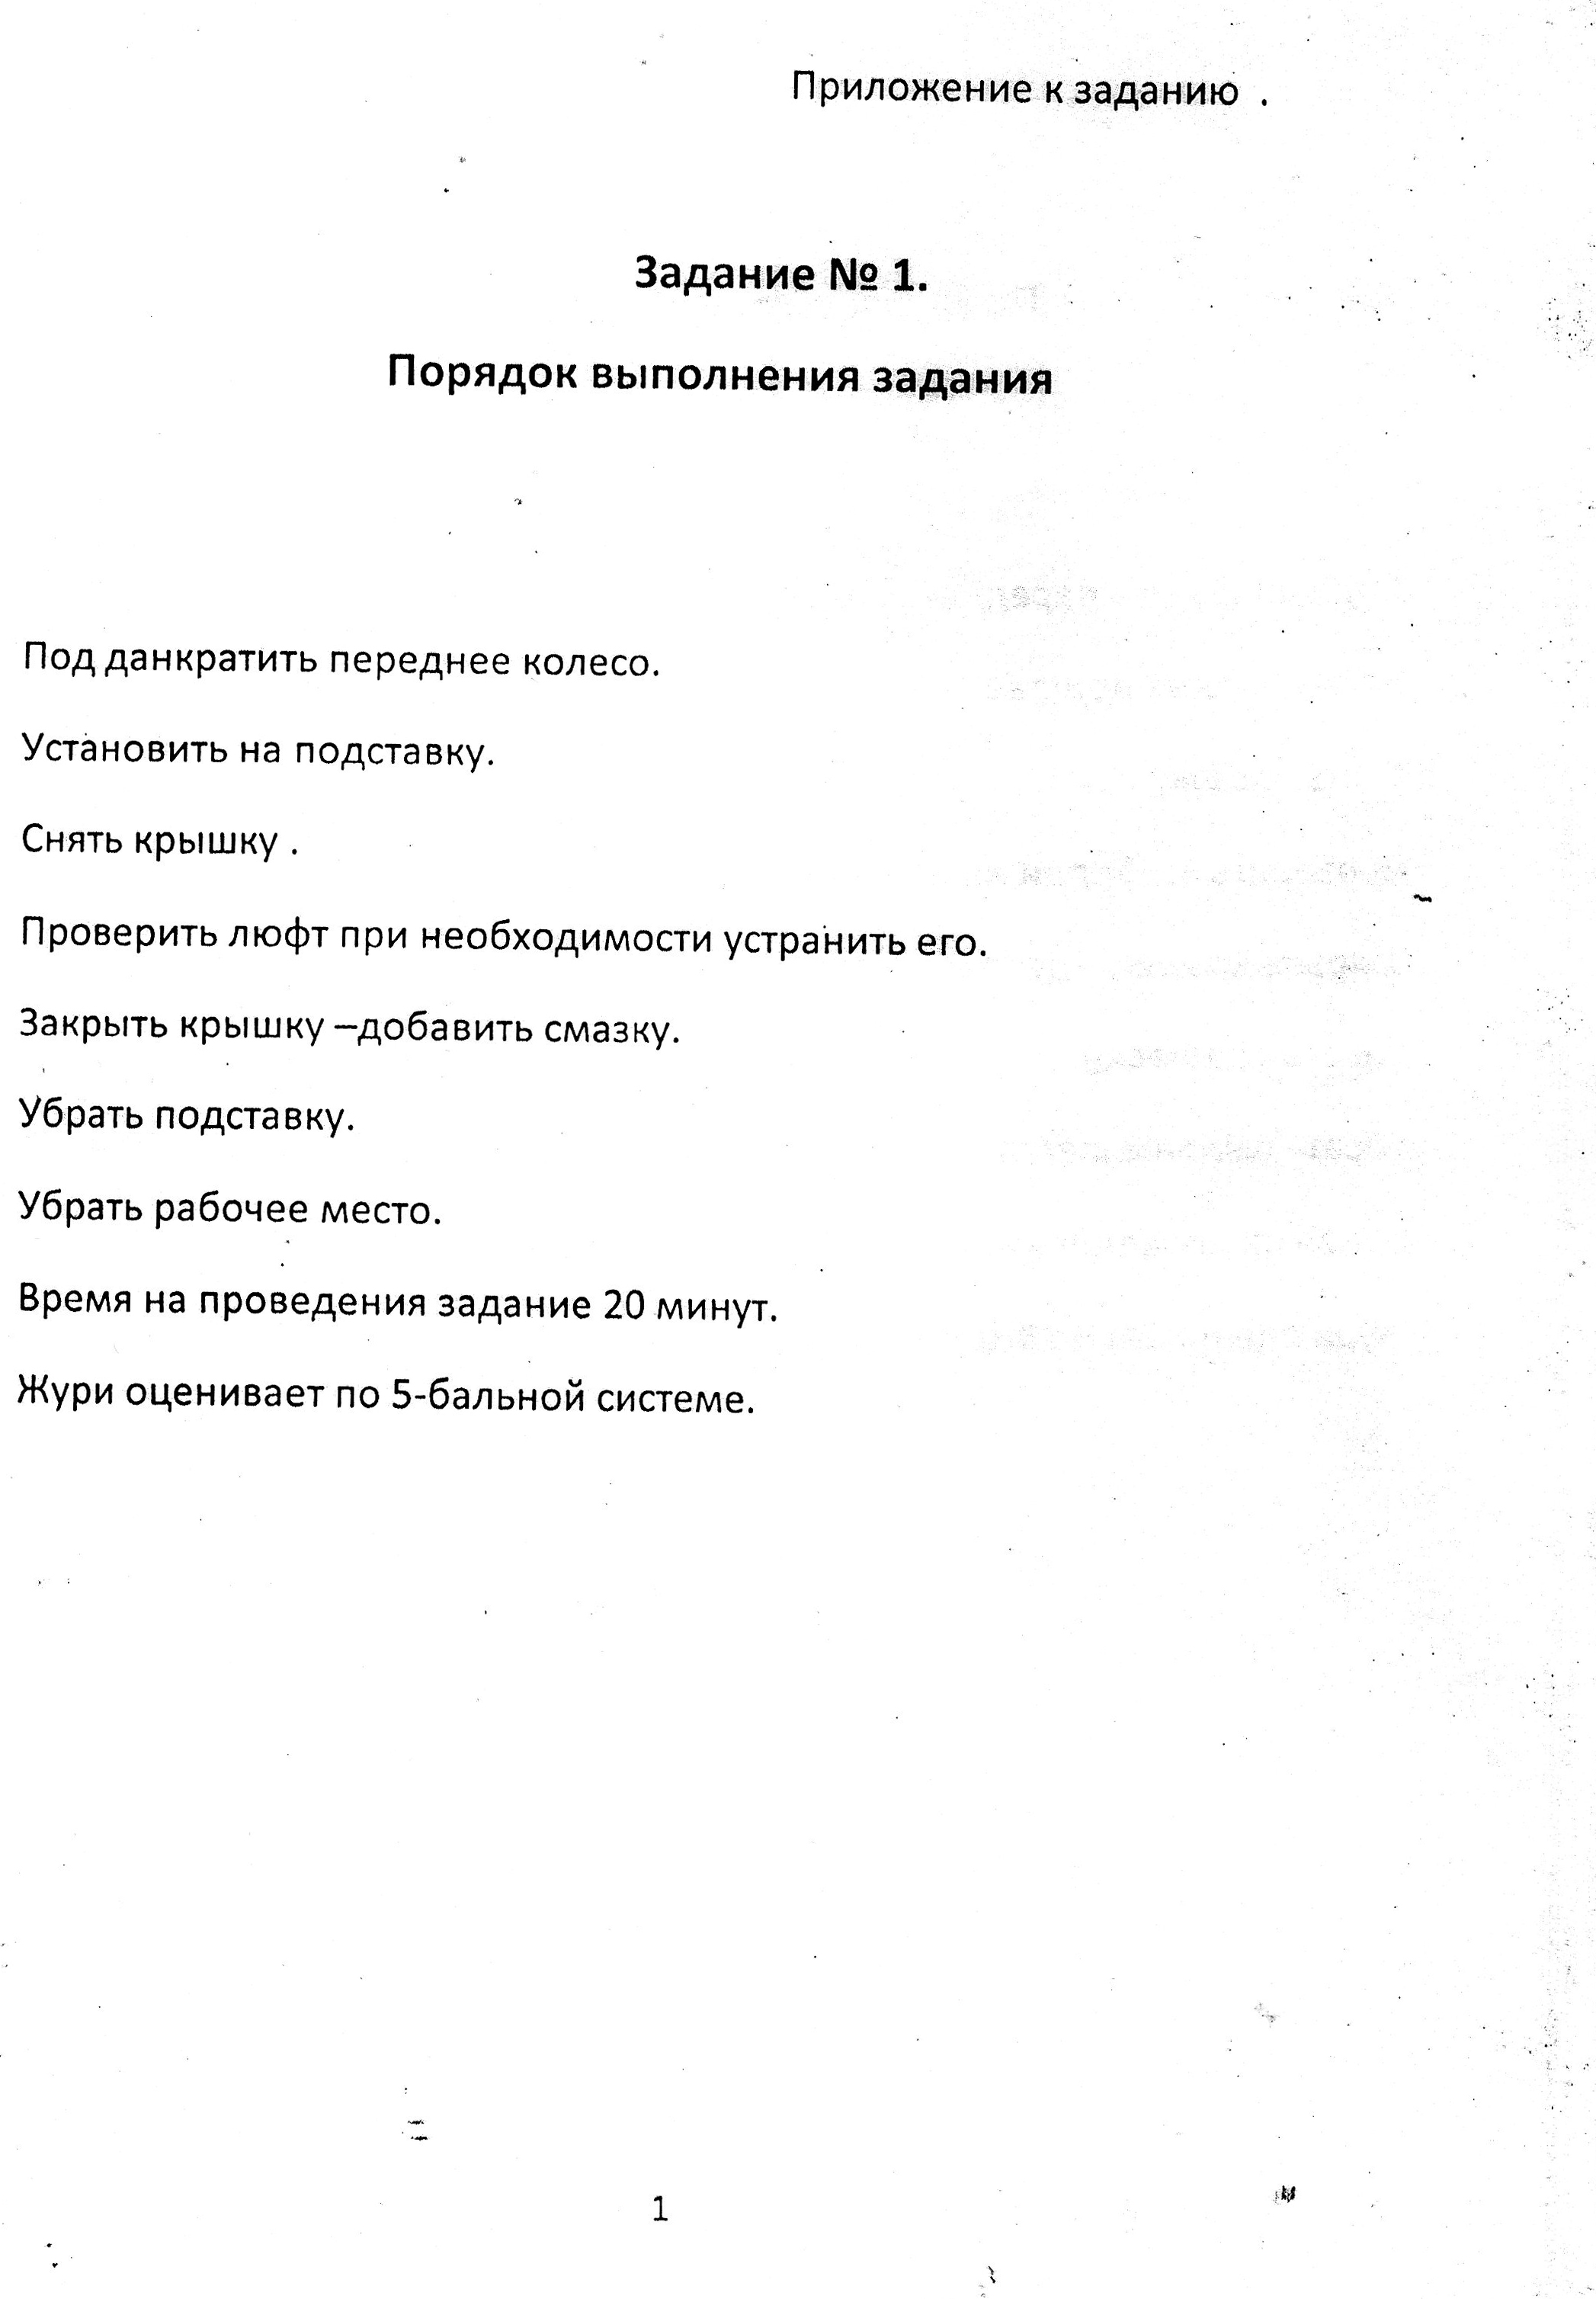 C:\Users\Василий Мельченко\Pictures\img568.jpg